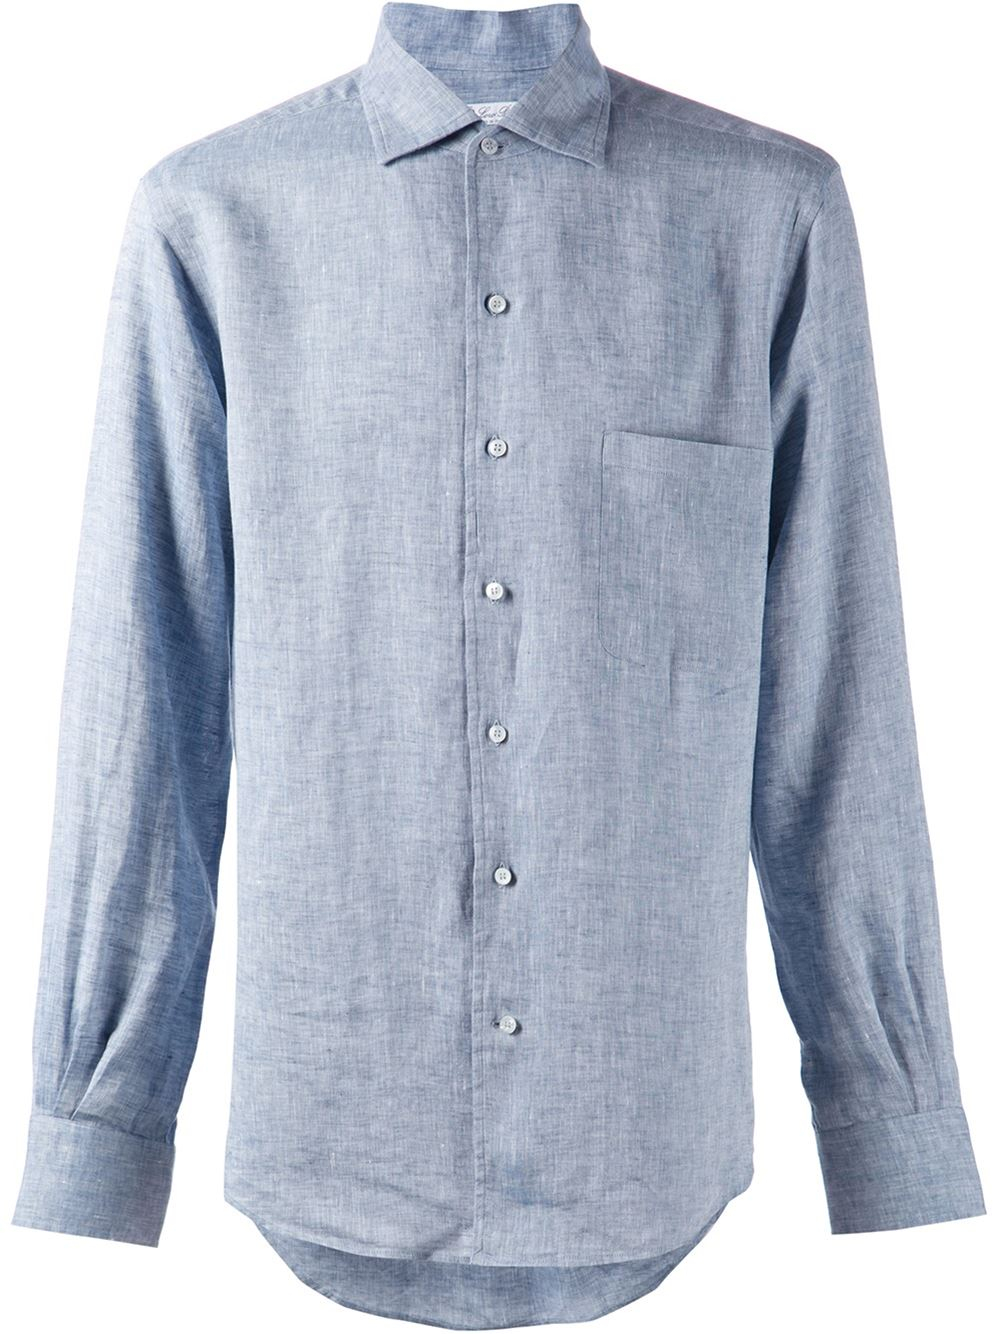 Loro piana spread collar shirt in blue for men lyst for What is a spread collar shirt